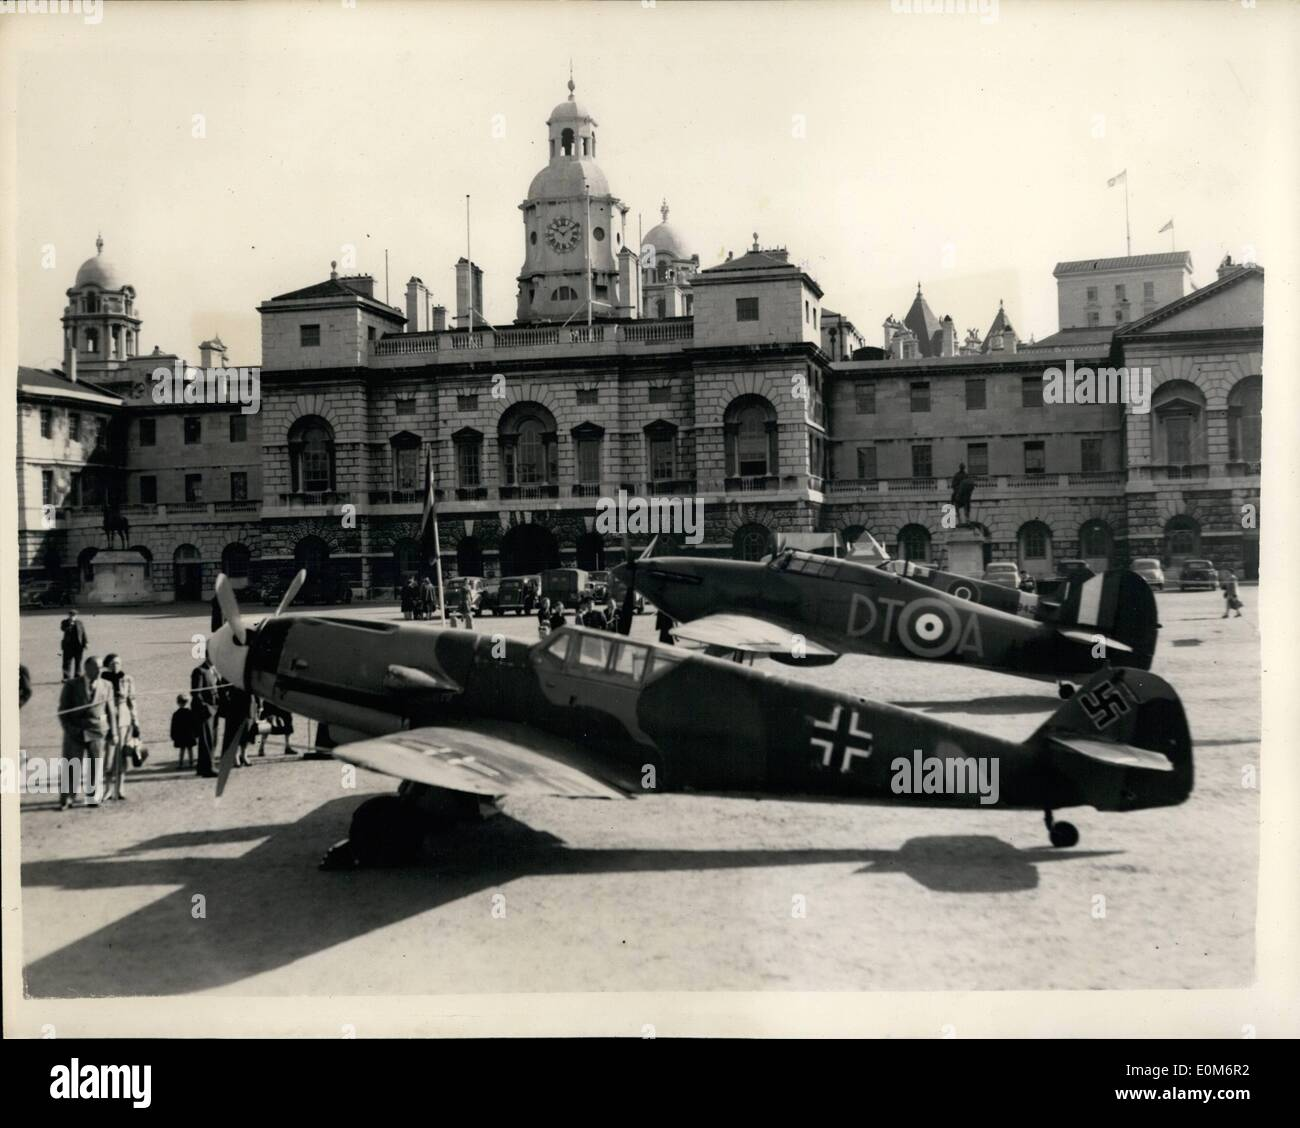 Sep. 09, 1953 - Battle of Britain Week. Aircraft On Display At Horse Guards Parade. Keystone Photo Shows:- SideStock Photo